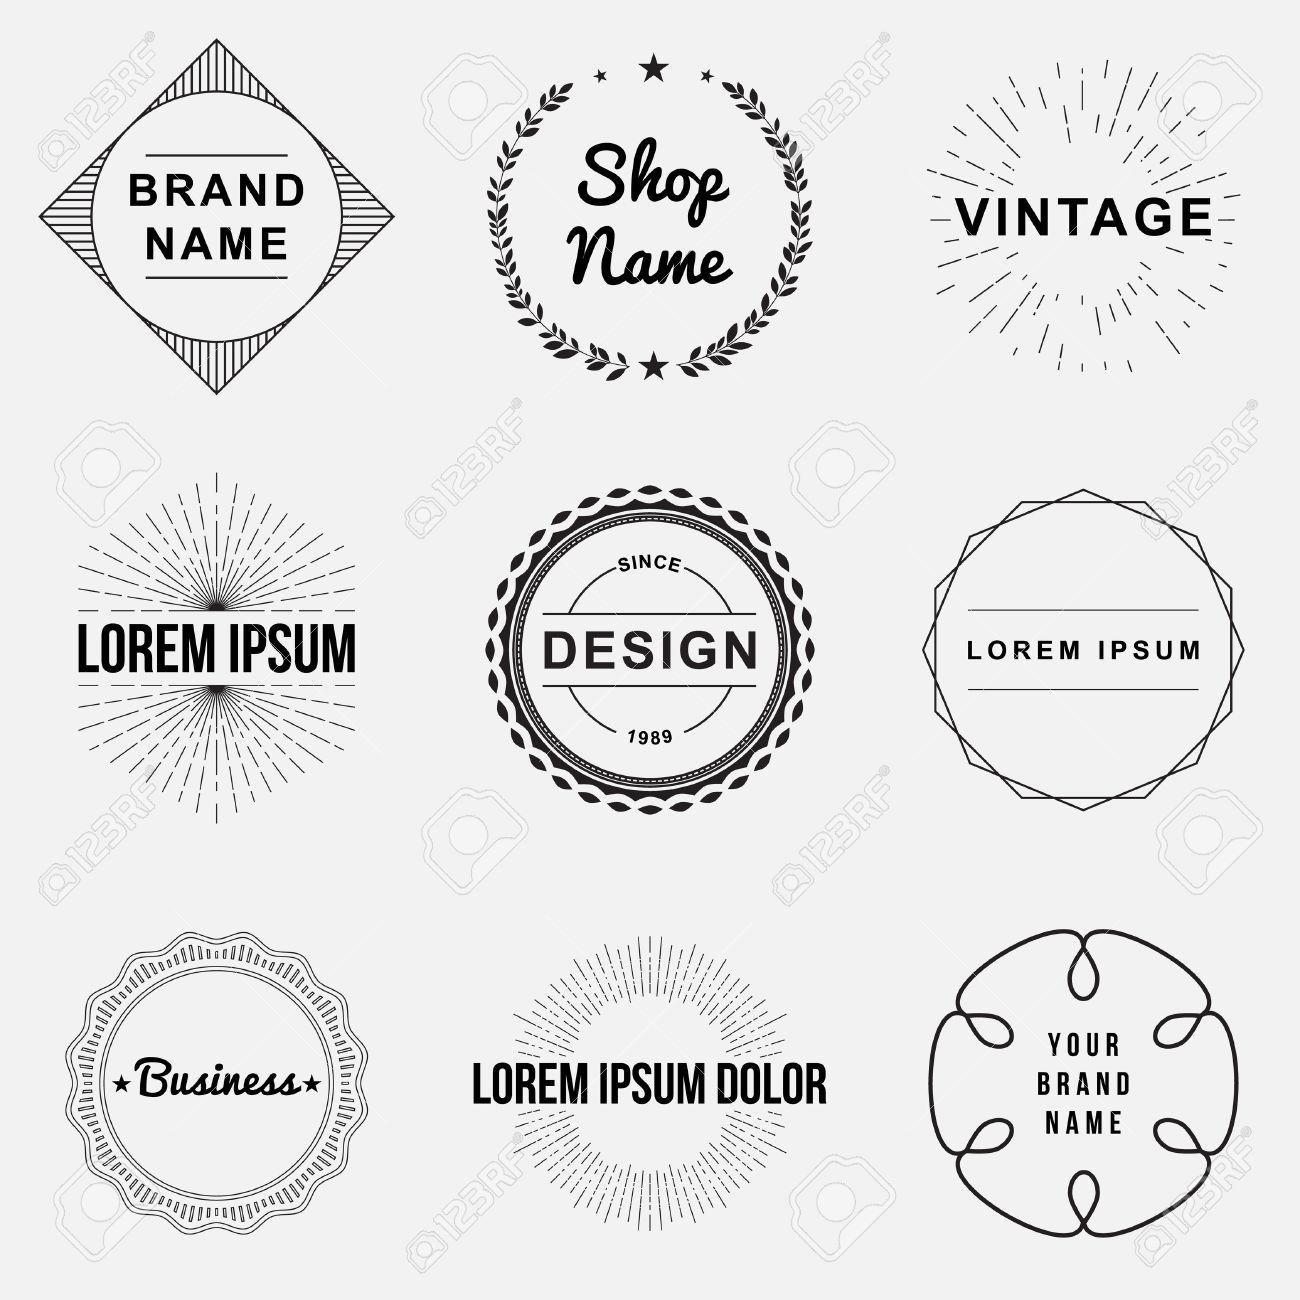 Set of retro vintage badges and label logo graphics. Design elements, business signs, labels, logos, circle design - 34243101